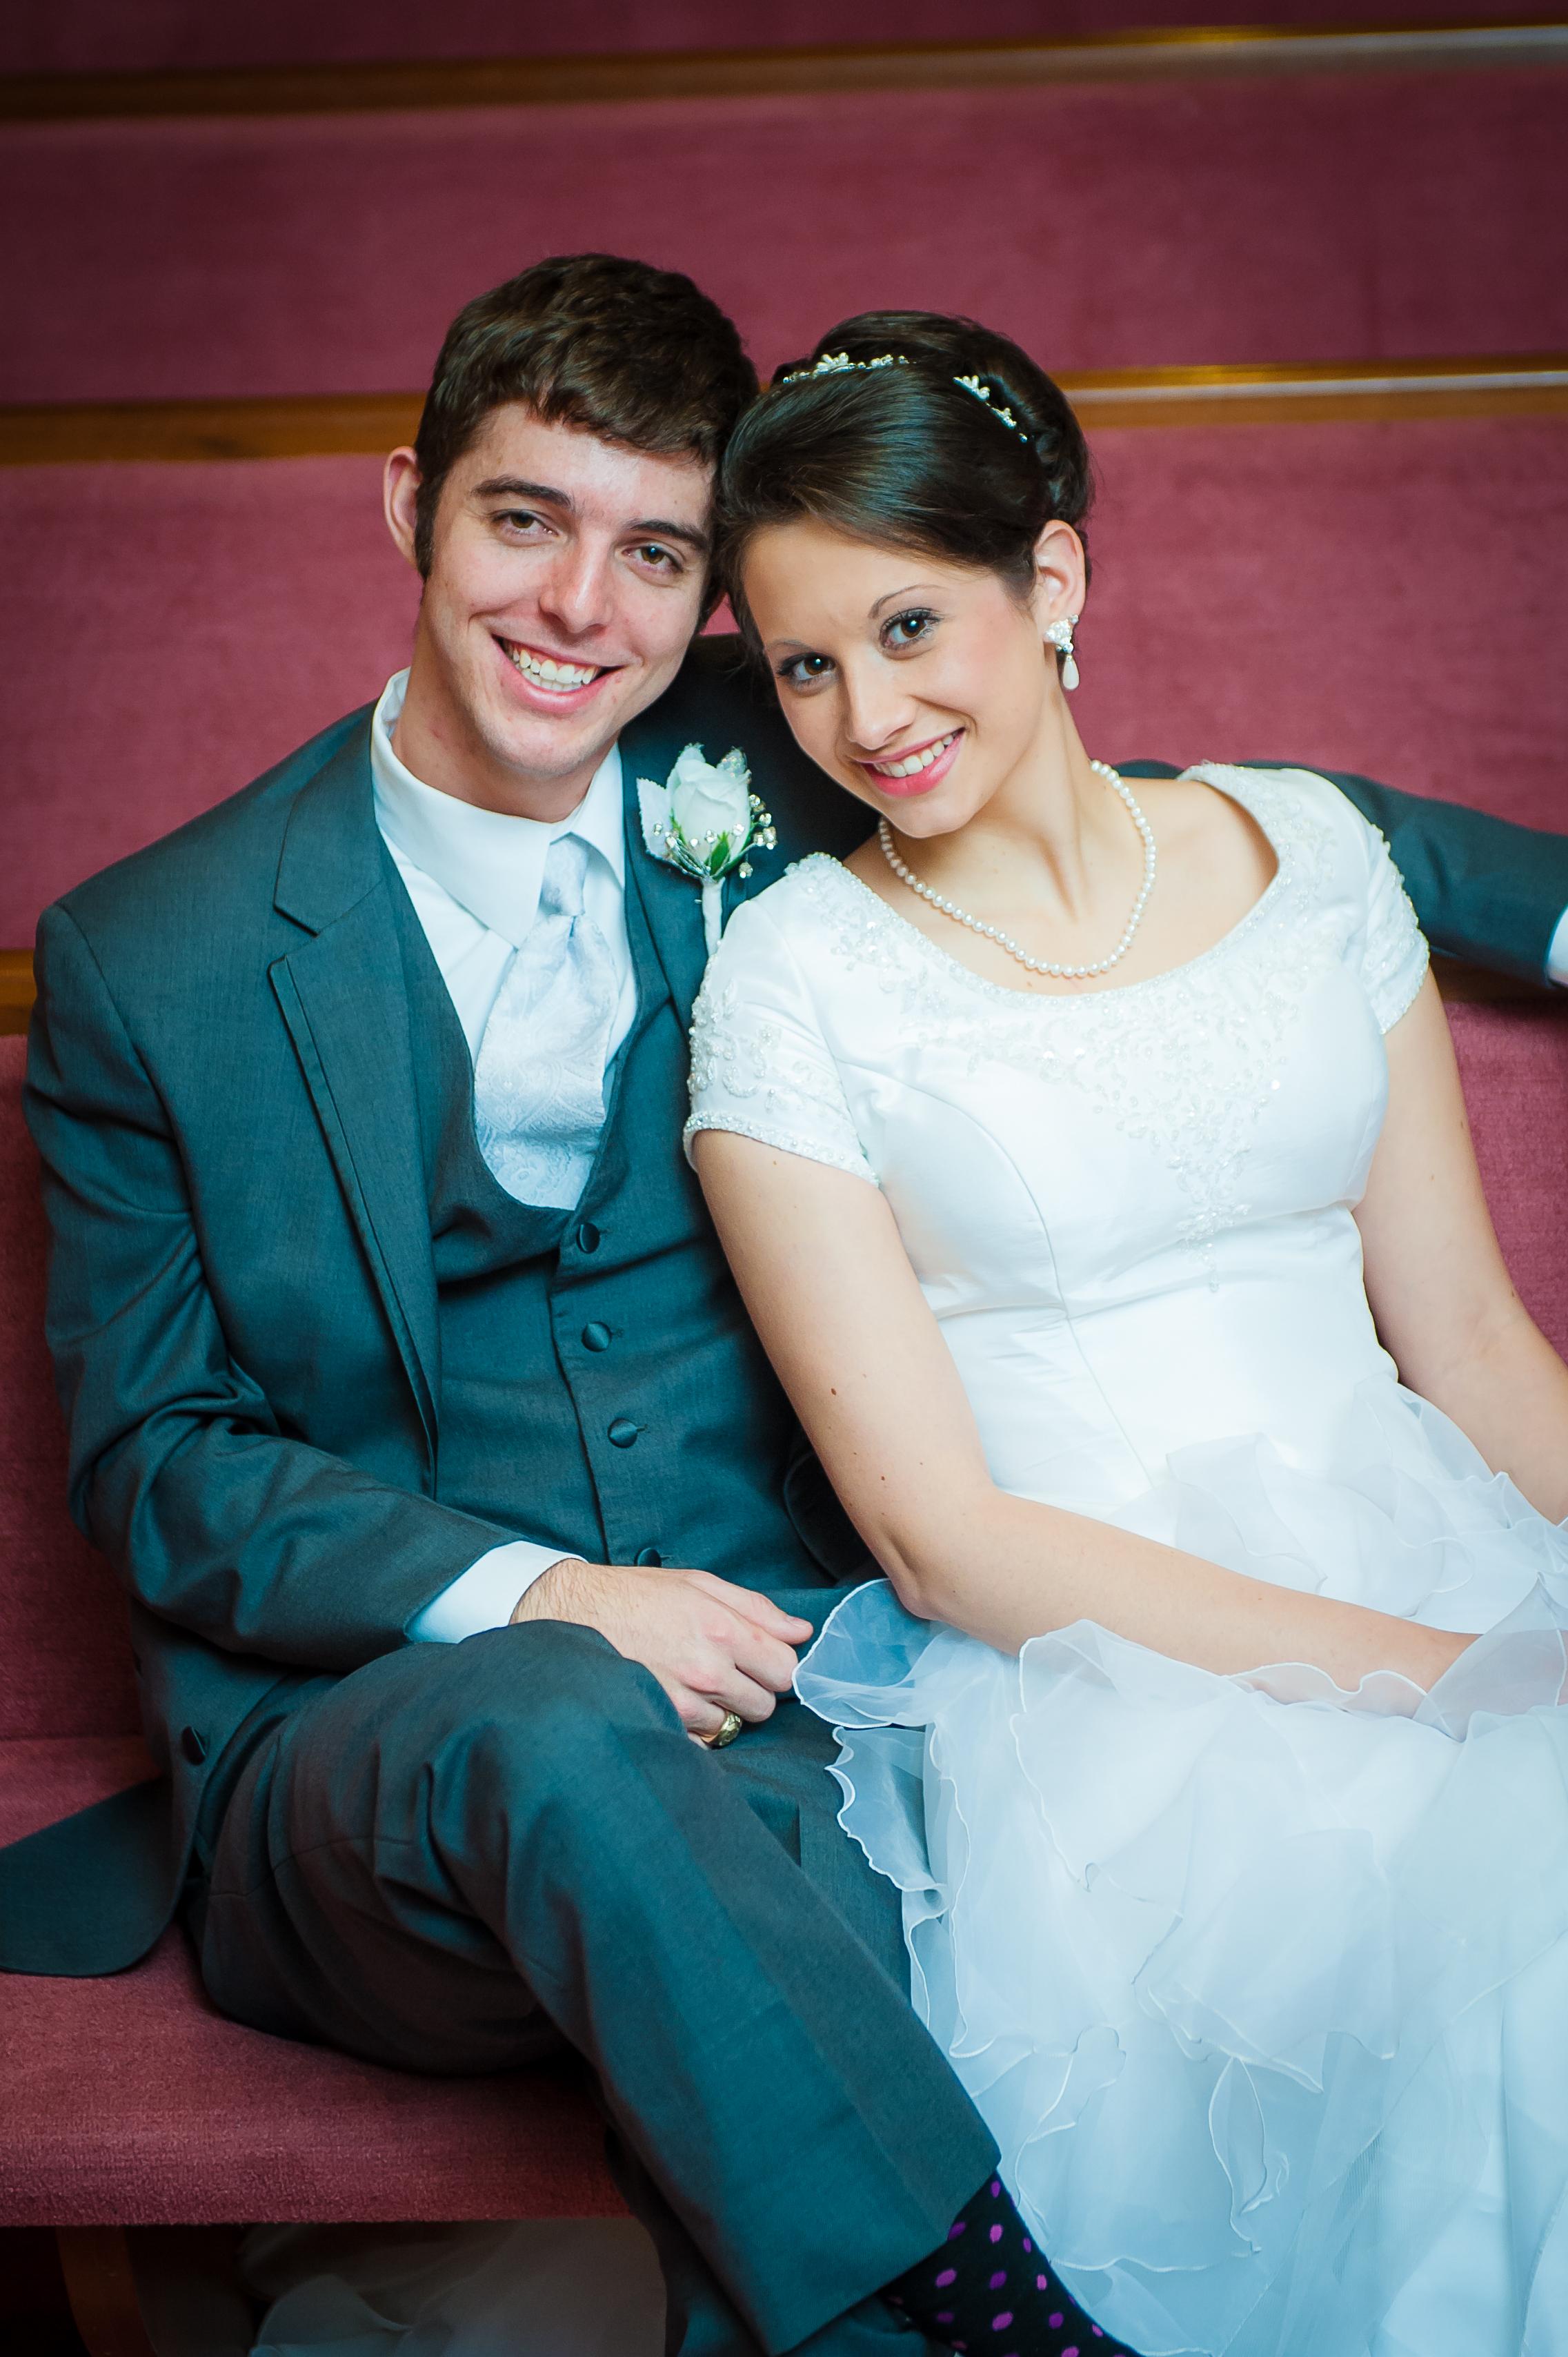 Post Wedding Portraits_Poole-0030.jpg